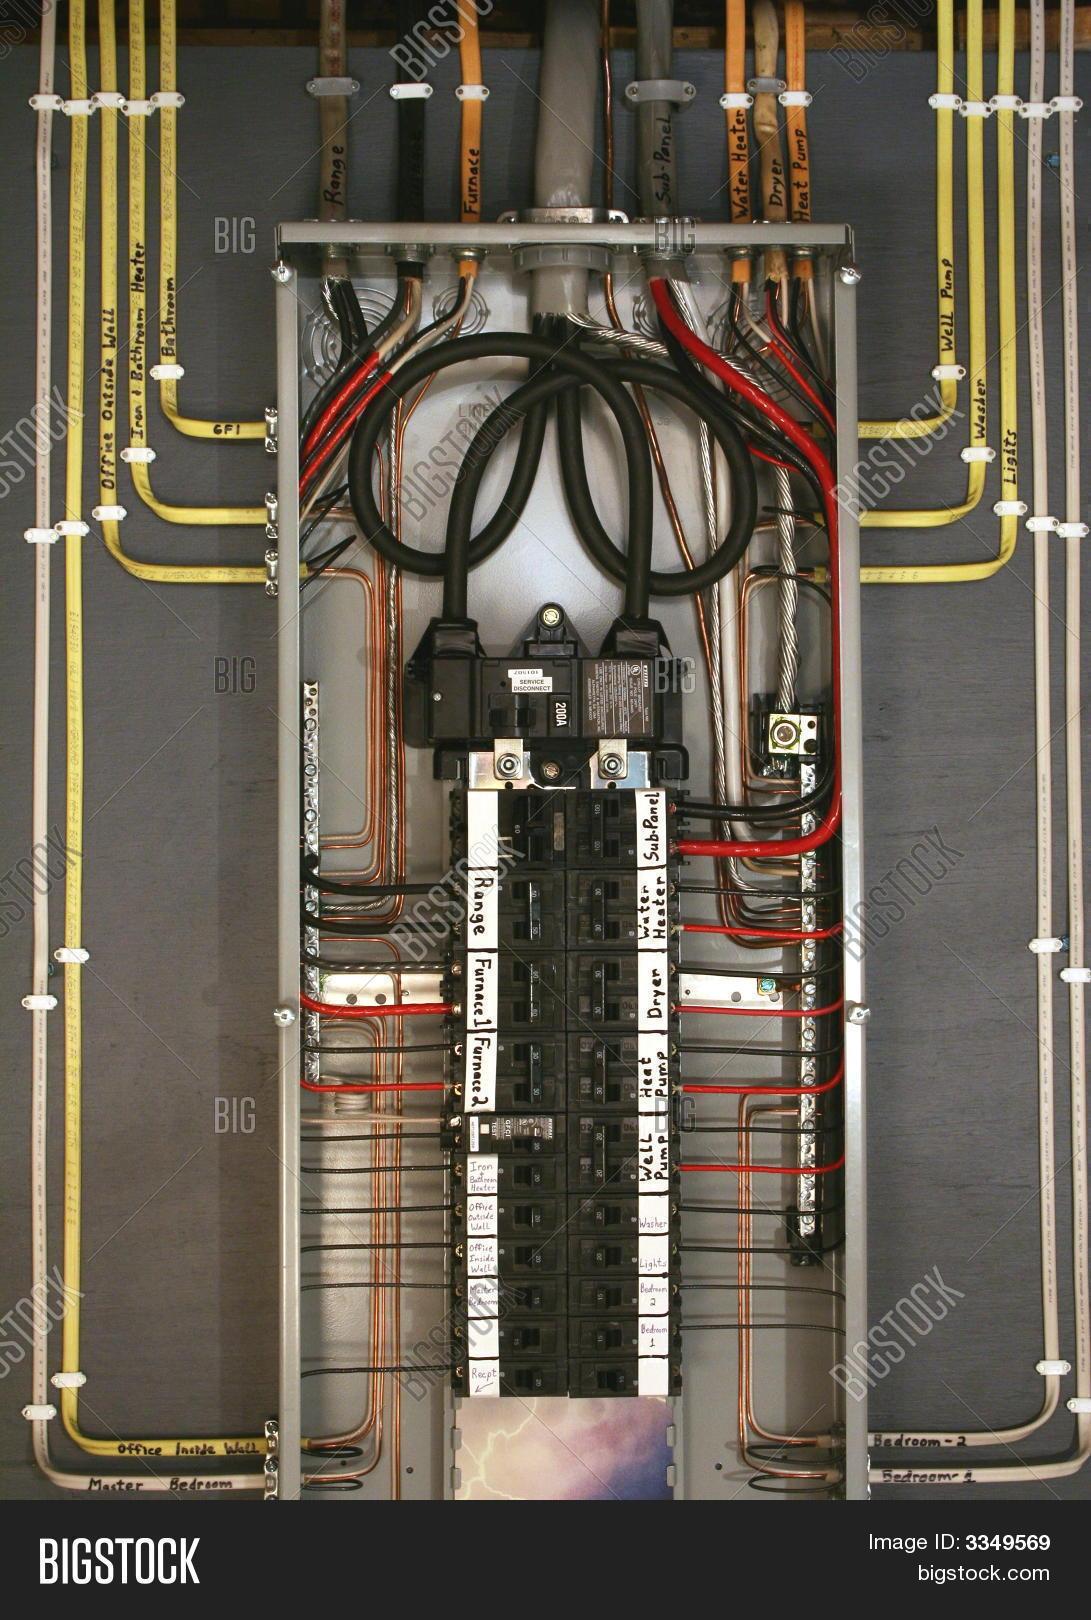 100 Sub Panel Wiring Diagram Breaker Box Image Amp Photo Free Trial Bigstock